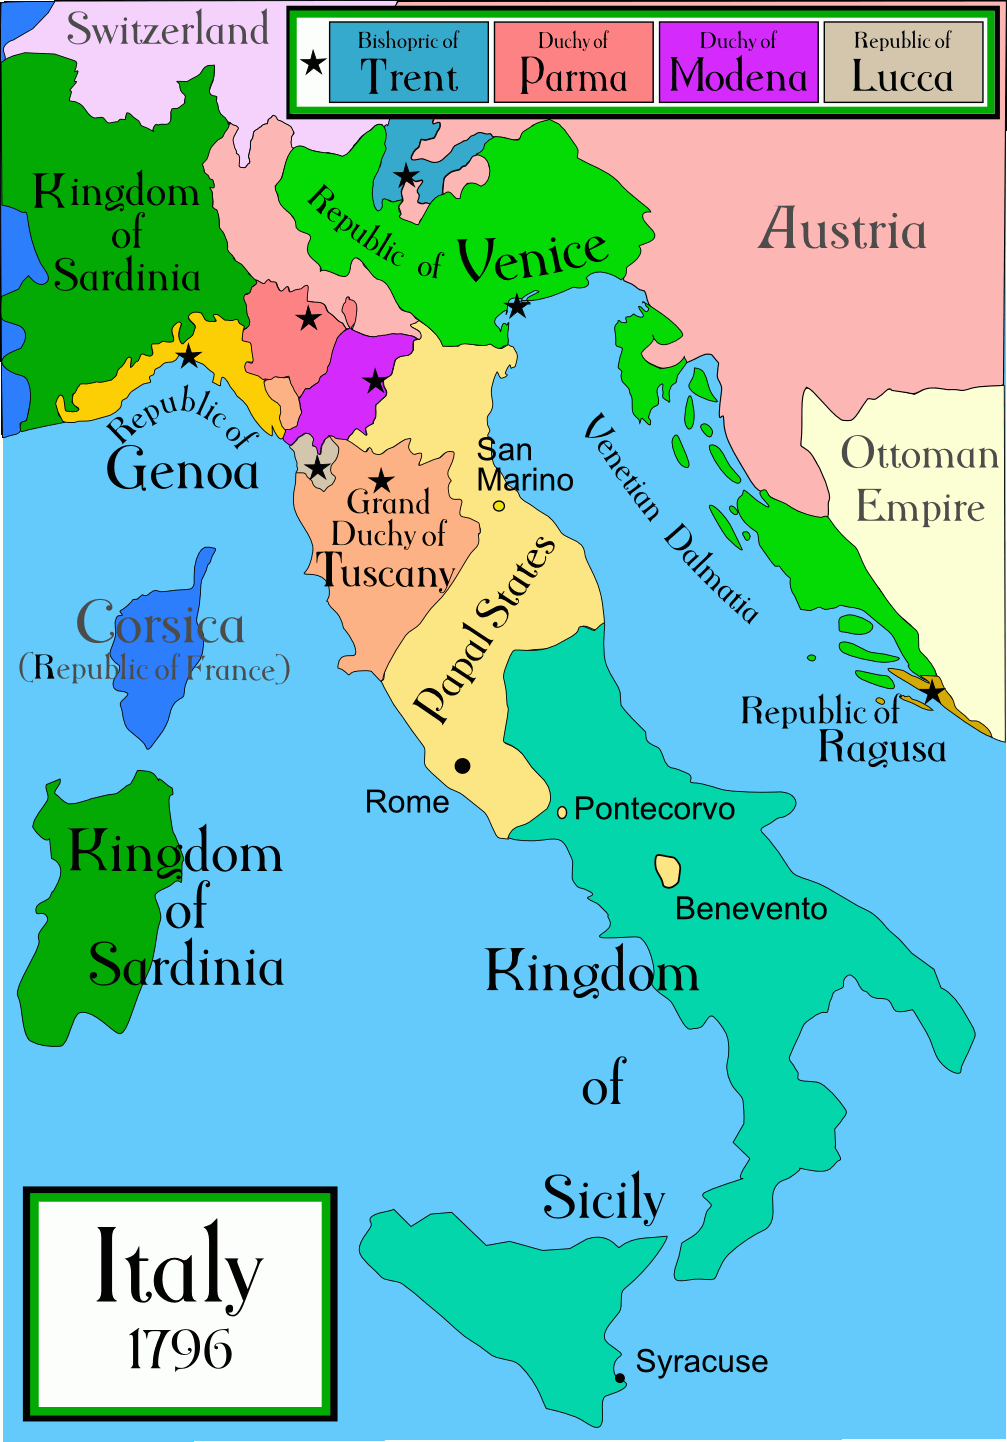 Kingdom of Sicily | Wiki Atlas of World History Wiki | FANDOM ... on lampedusa island italy map, viceroyalty of peru on map, county of tripoli on map, kingdom of sicily flag, battle of cannae on map, principality of antioch on map, ryukyu kingdom on map,